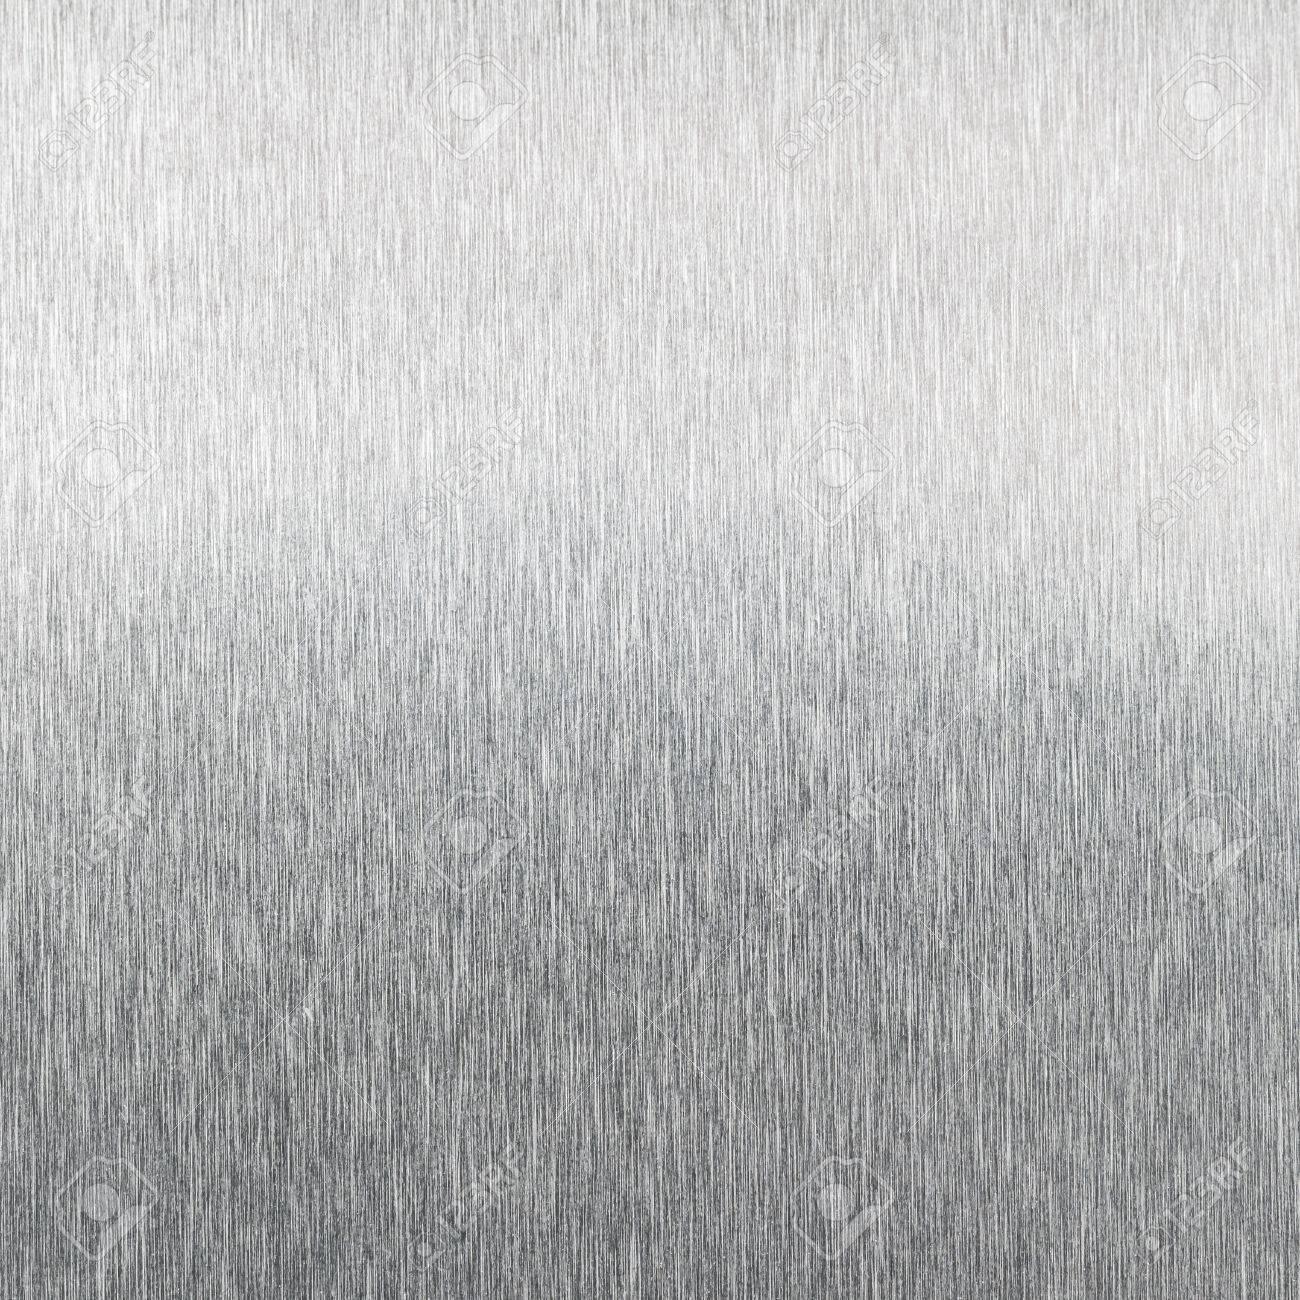 Close up of aluminium foil  sheet  surface, texture of rubbed aluminium foil Stock Photo - 16608038